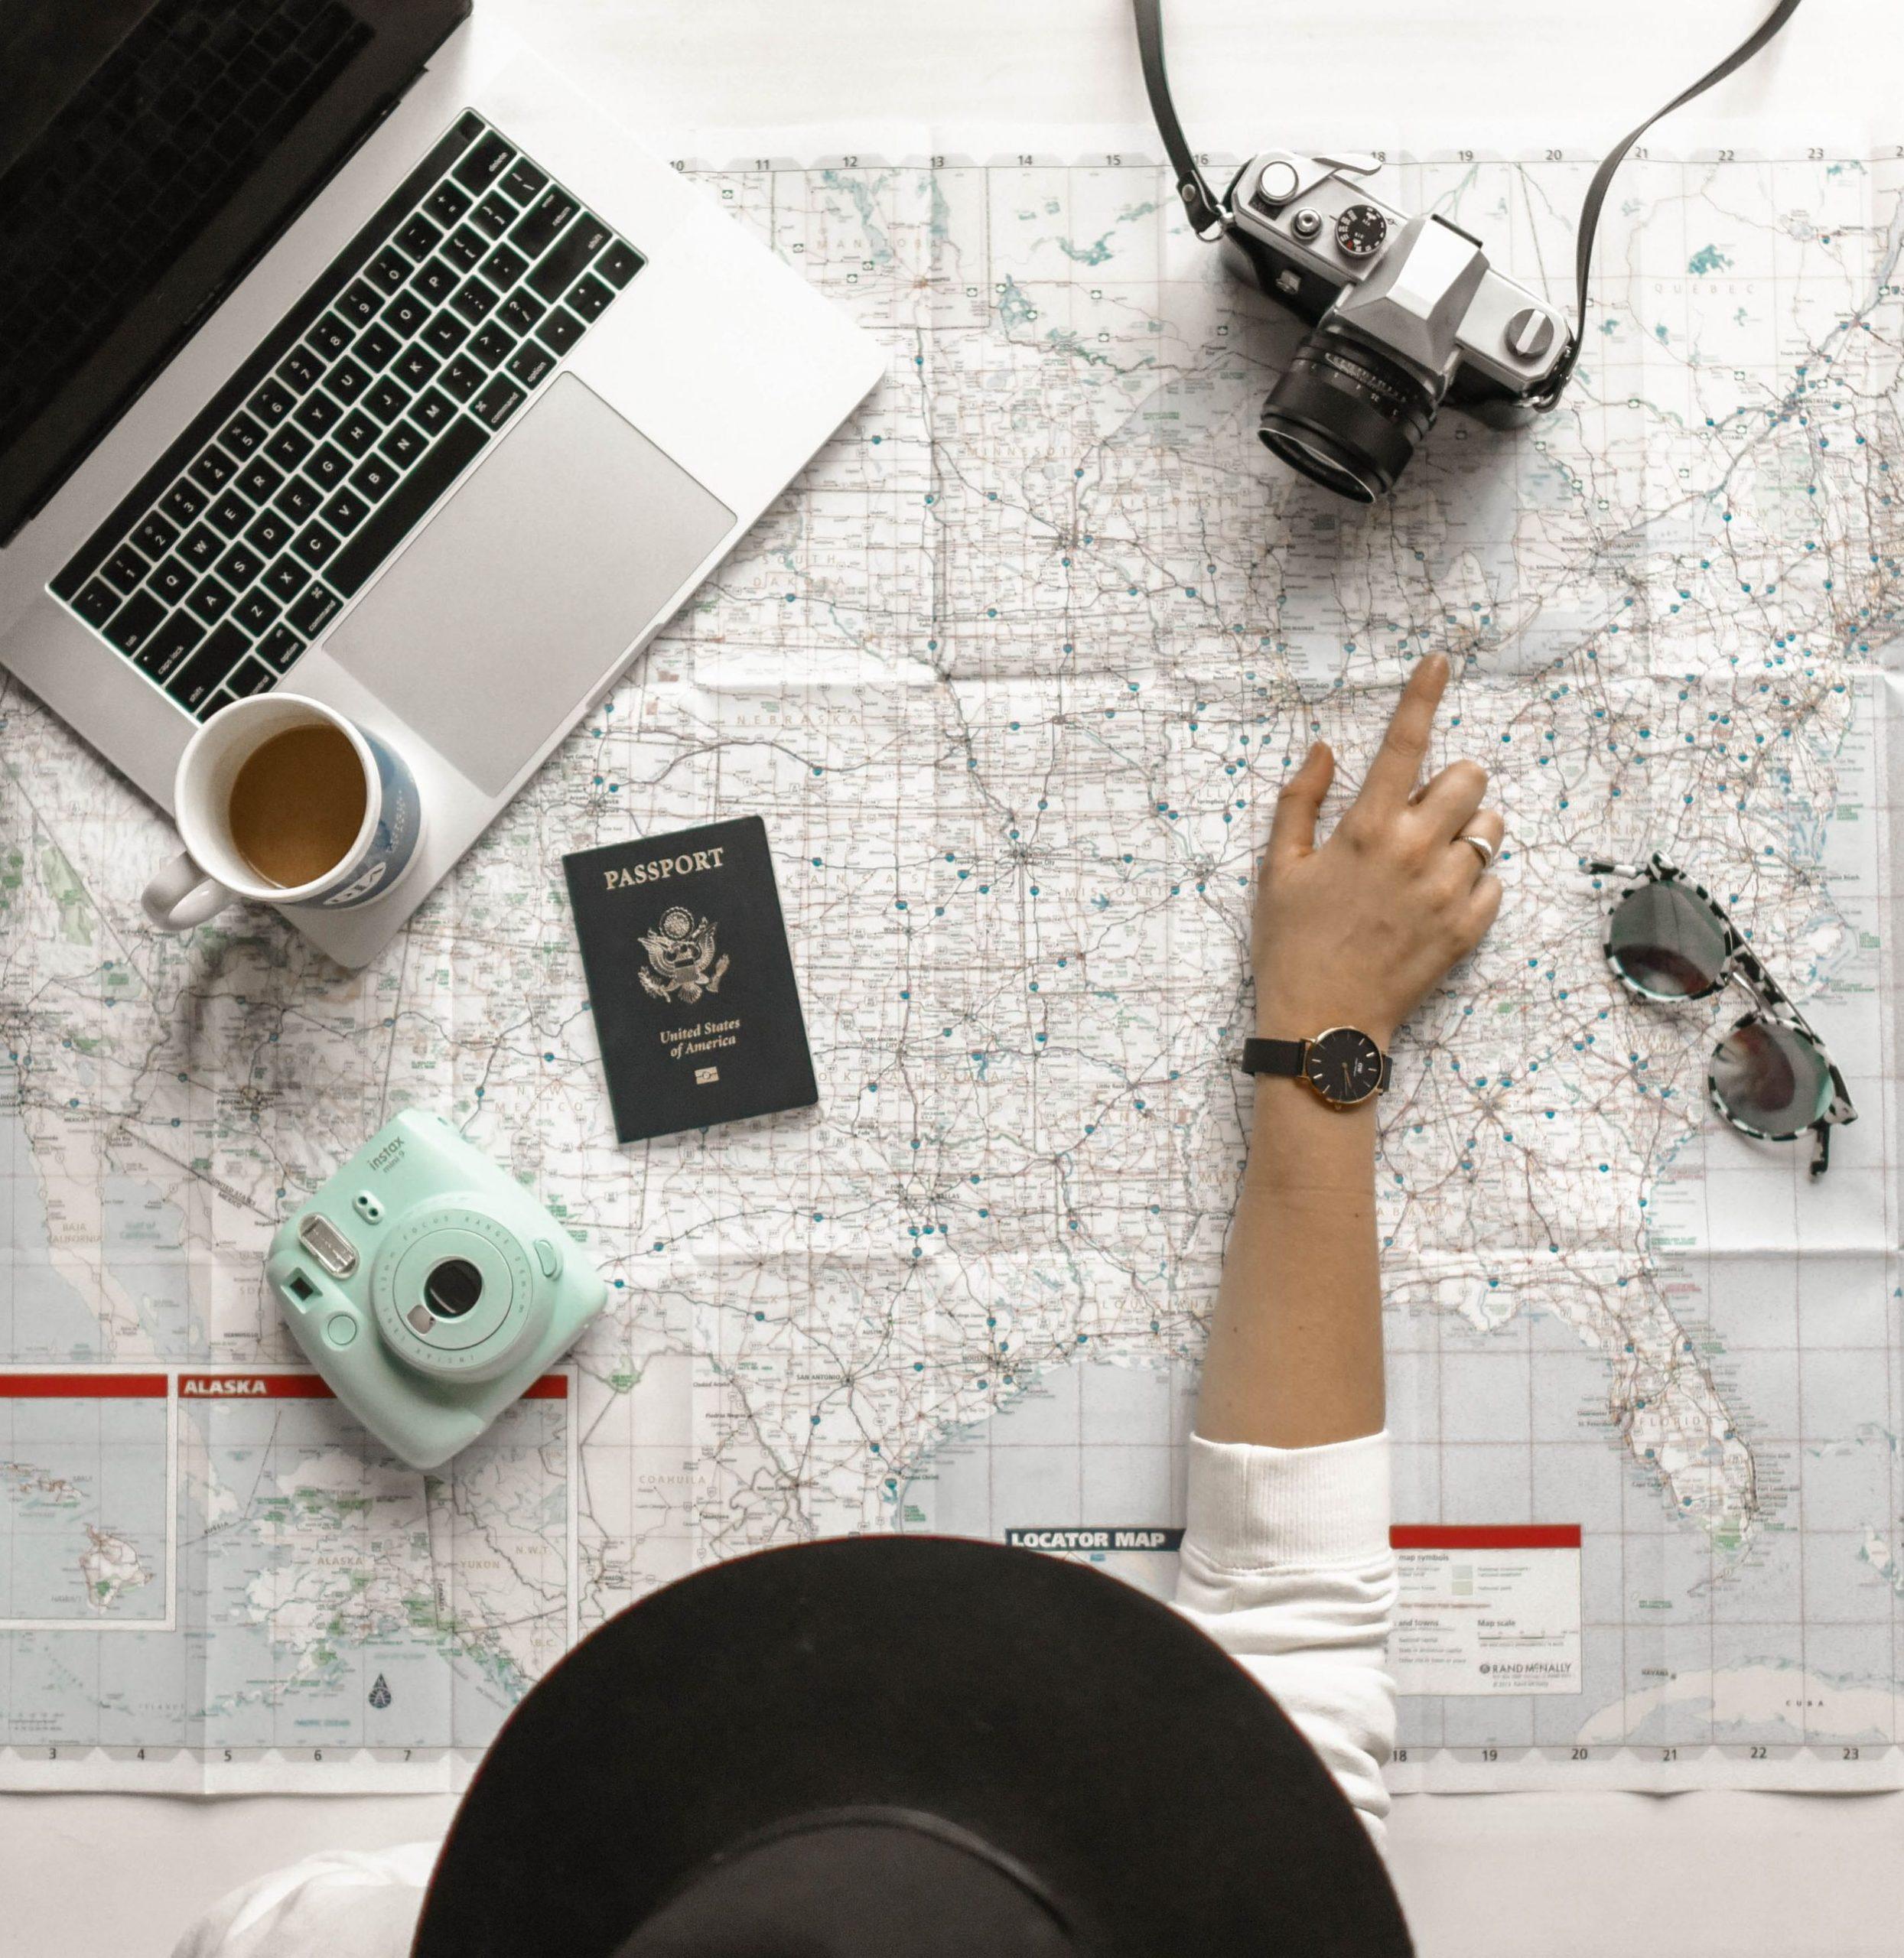 Reiselust trotz Corona ungebrochen